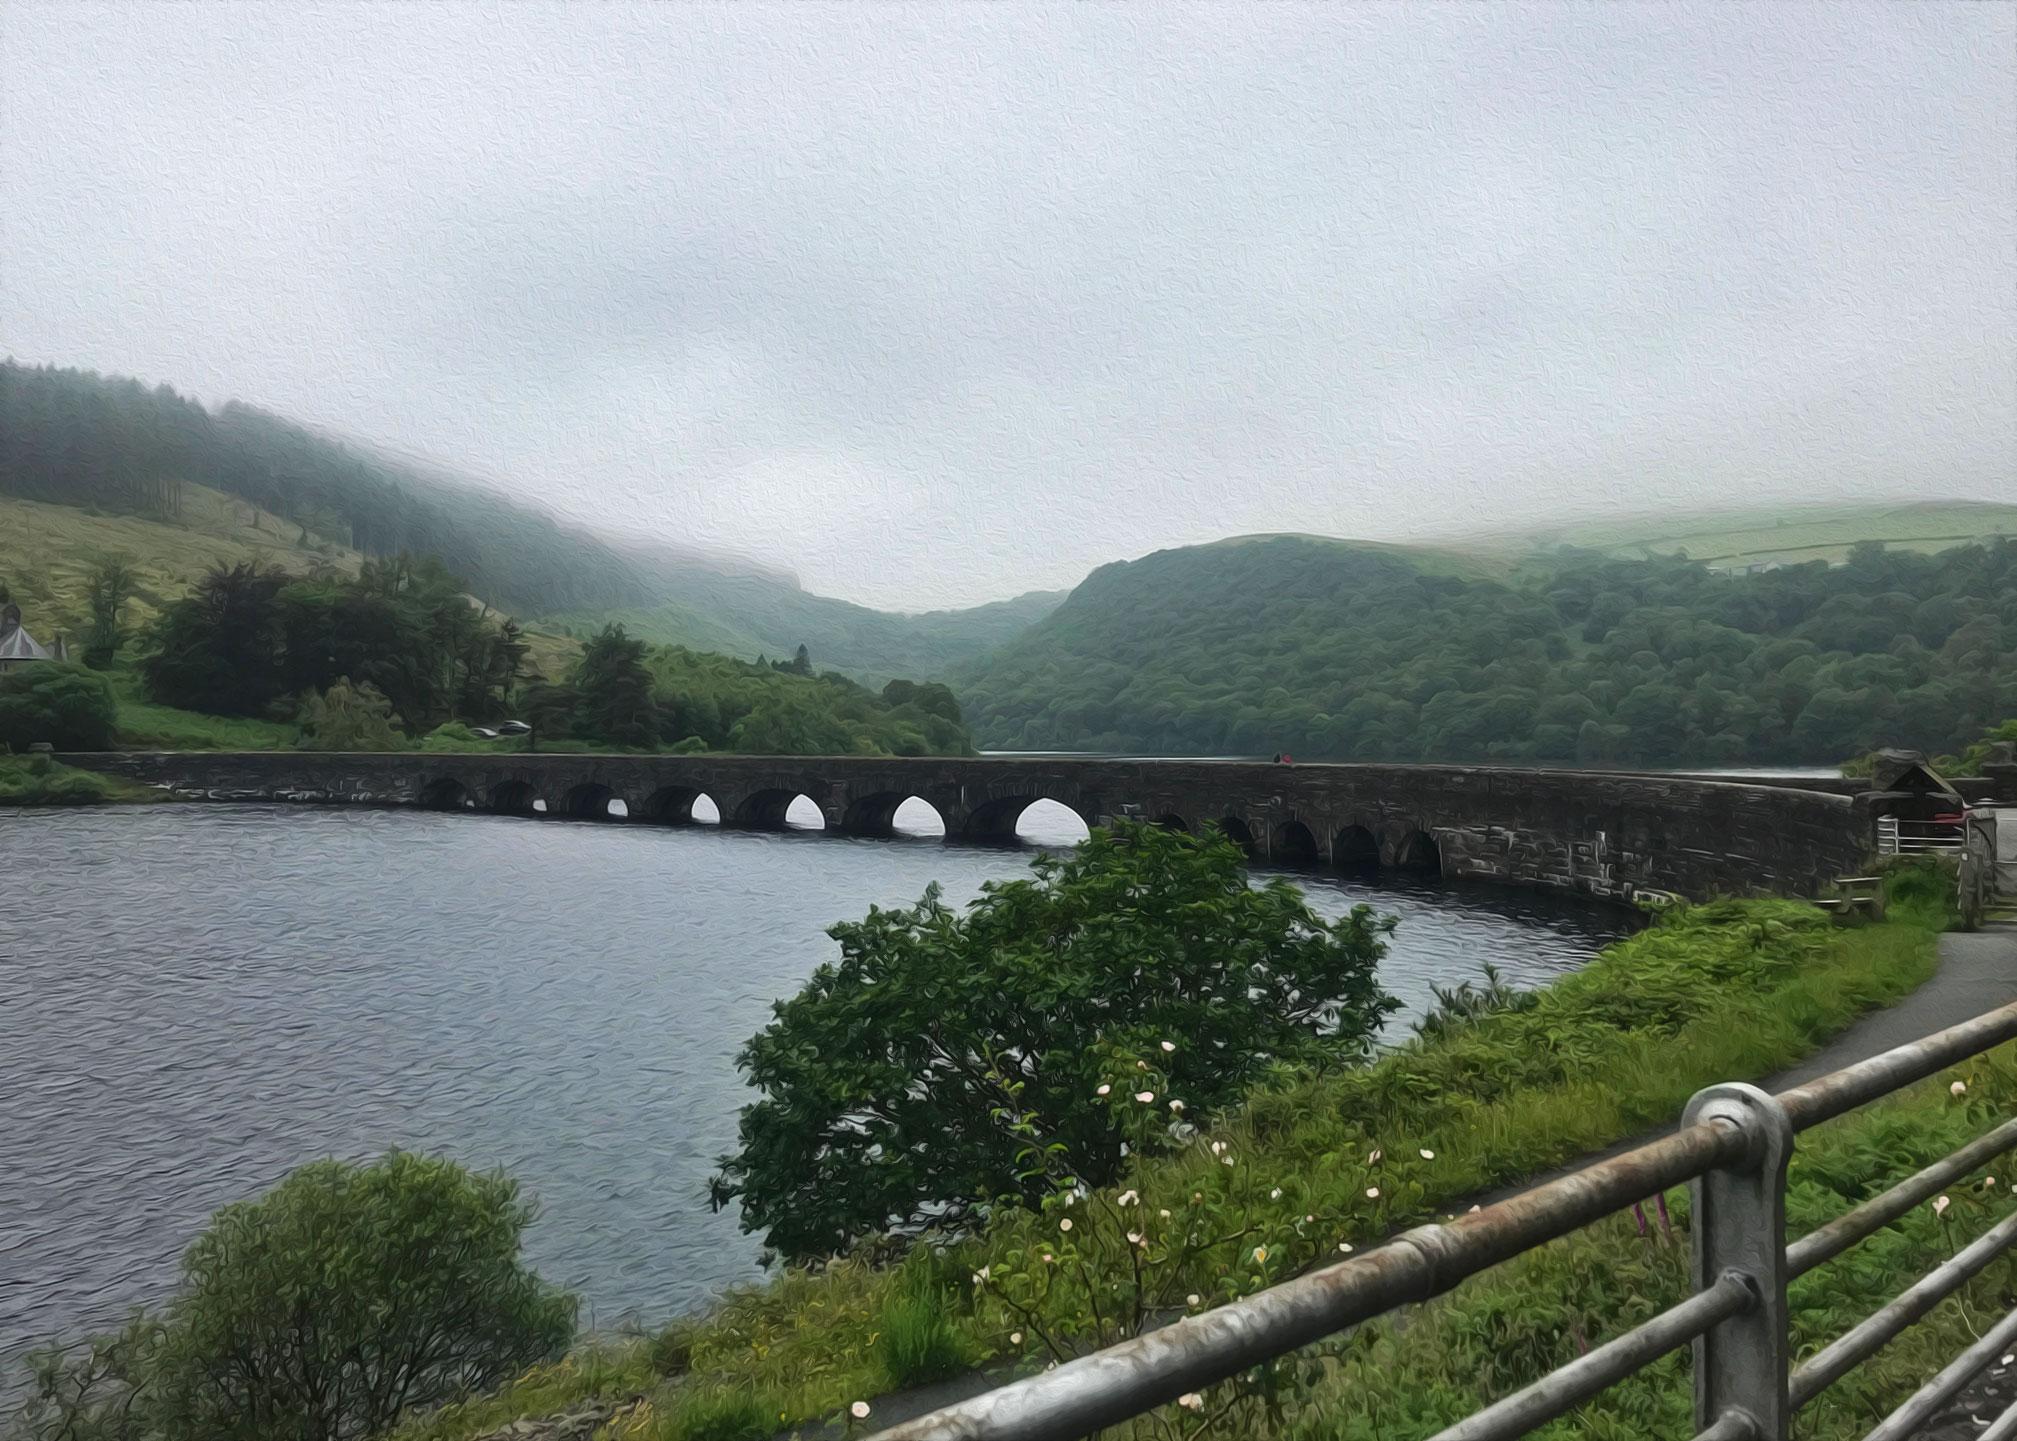 Mid Wales: Garreg-ddu reservoir